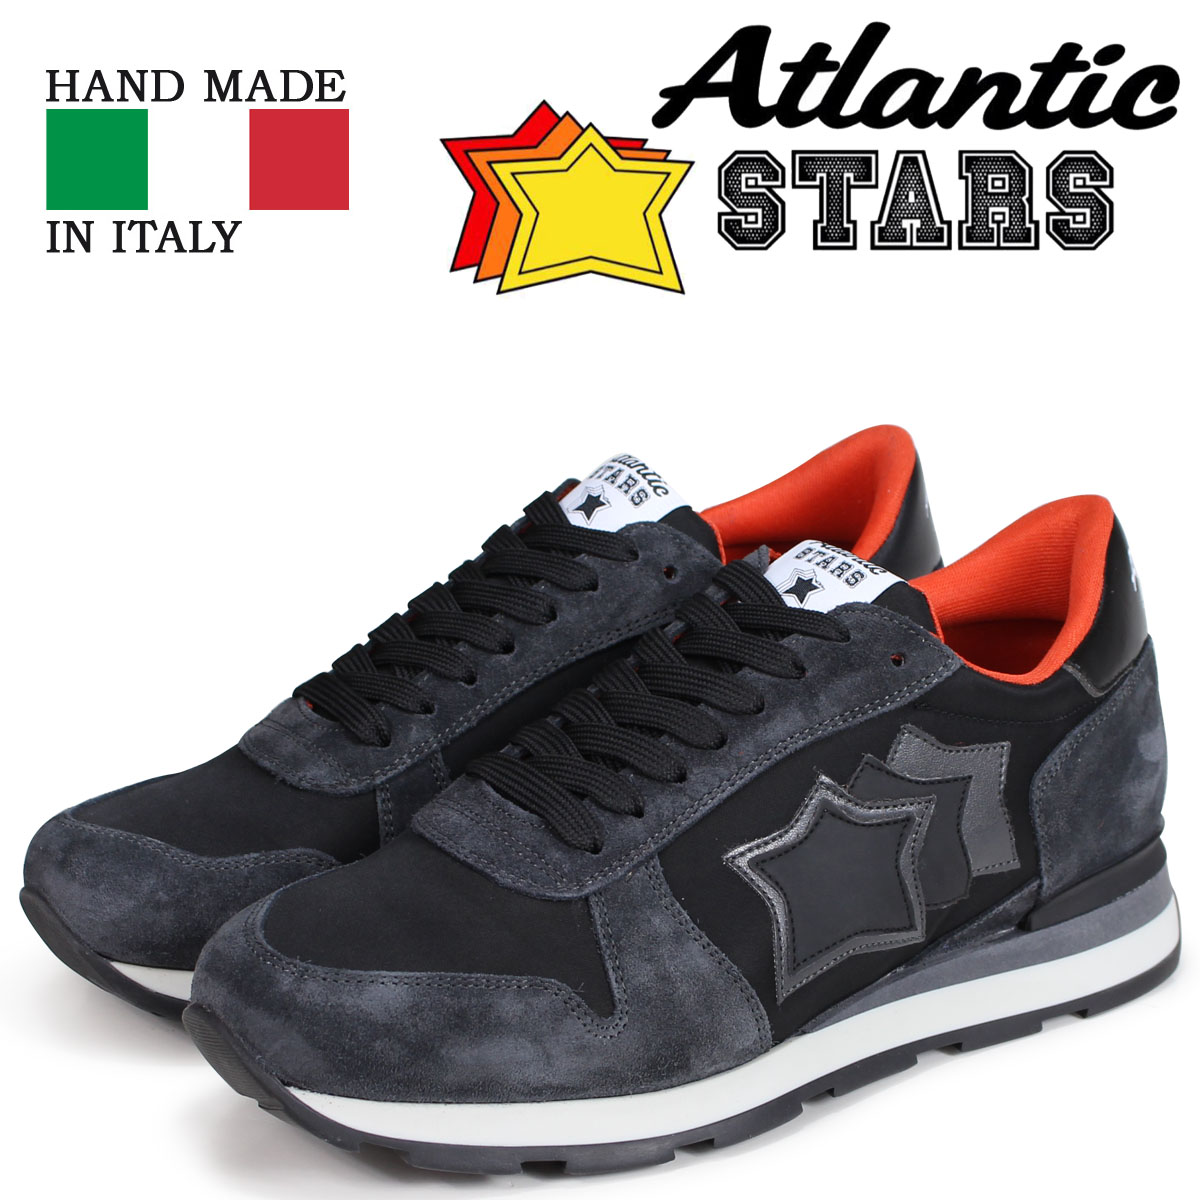 Atlantic STARS メンズ スニーカー アトランティックスターズ シリウス SIRIUS NGA-81N ブラック 黒